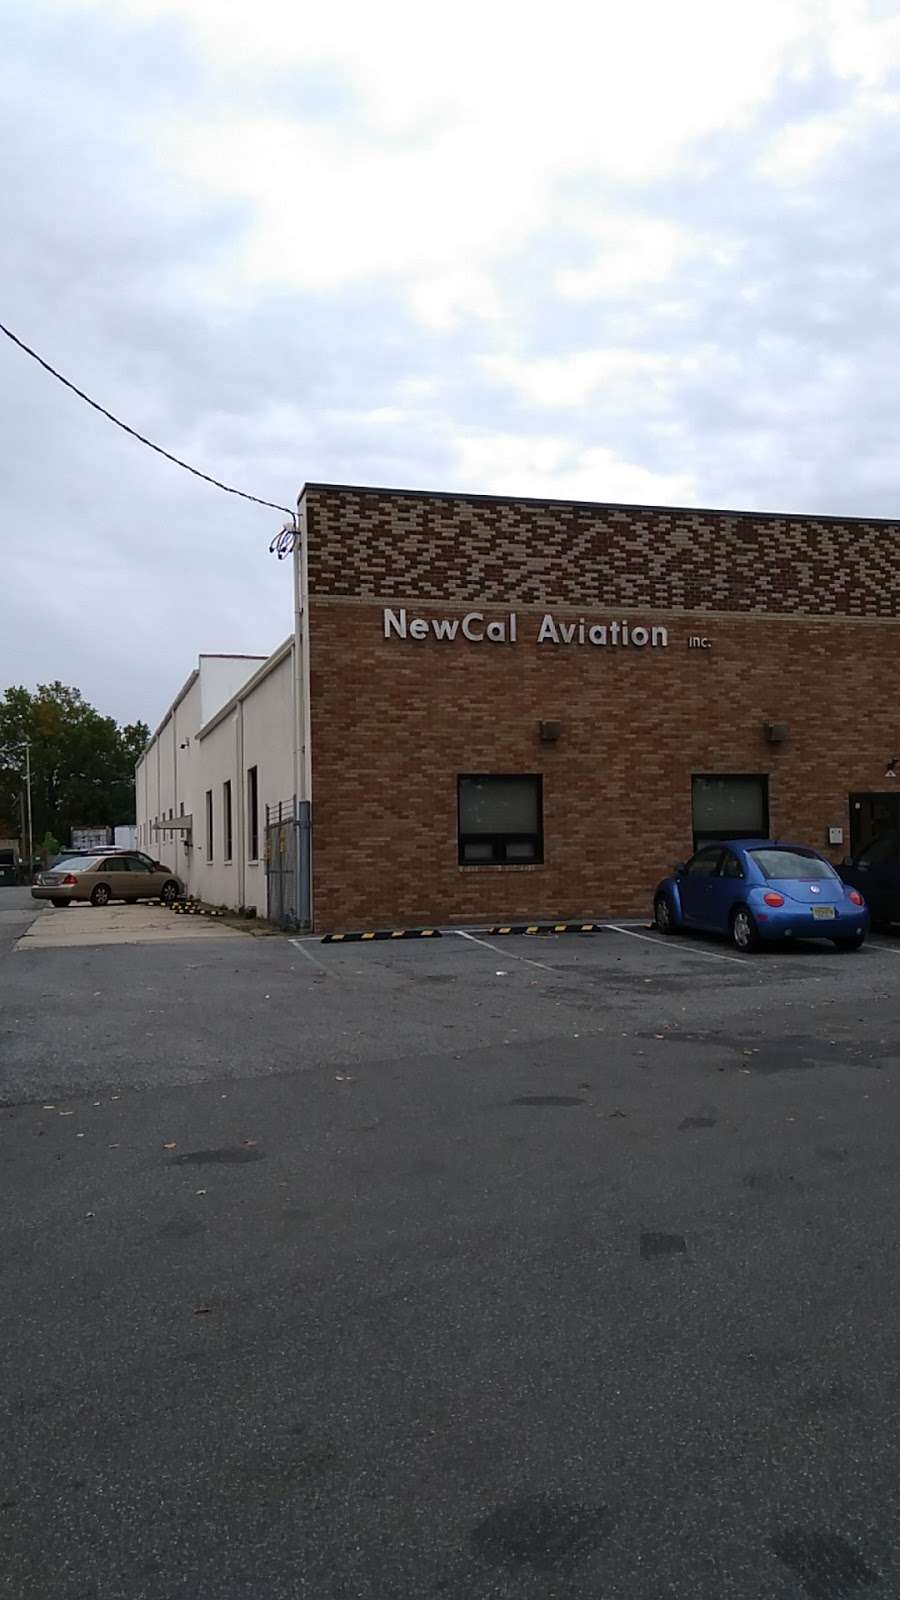 Newcal Aviation - store  | Photo 1 of 2 | Address: 14 Riser Rd, Little Ferry, NJ 07643, USA | Phone: (201) 440-1990